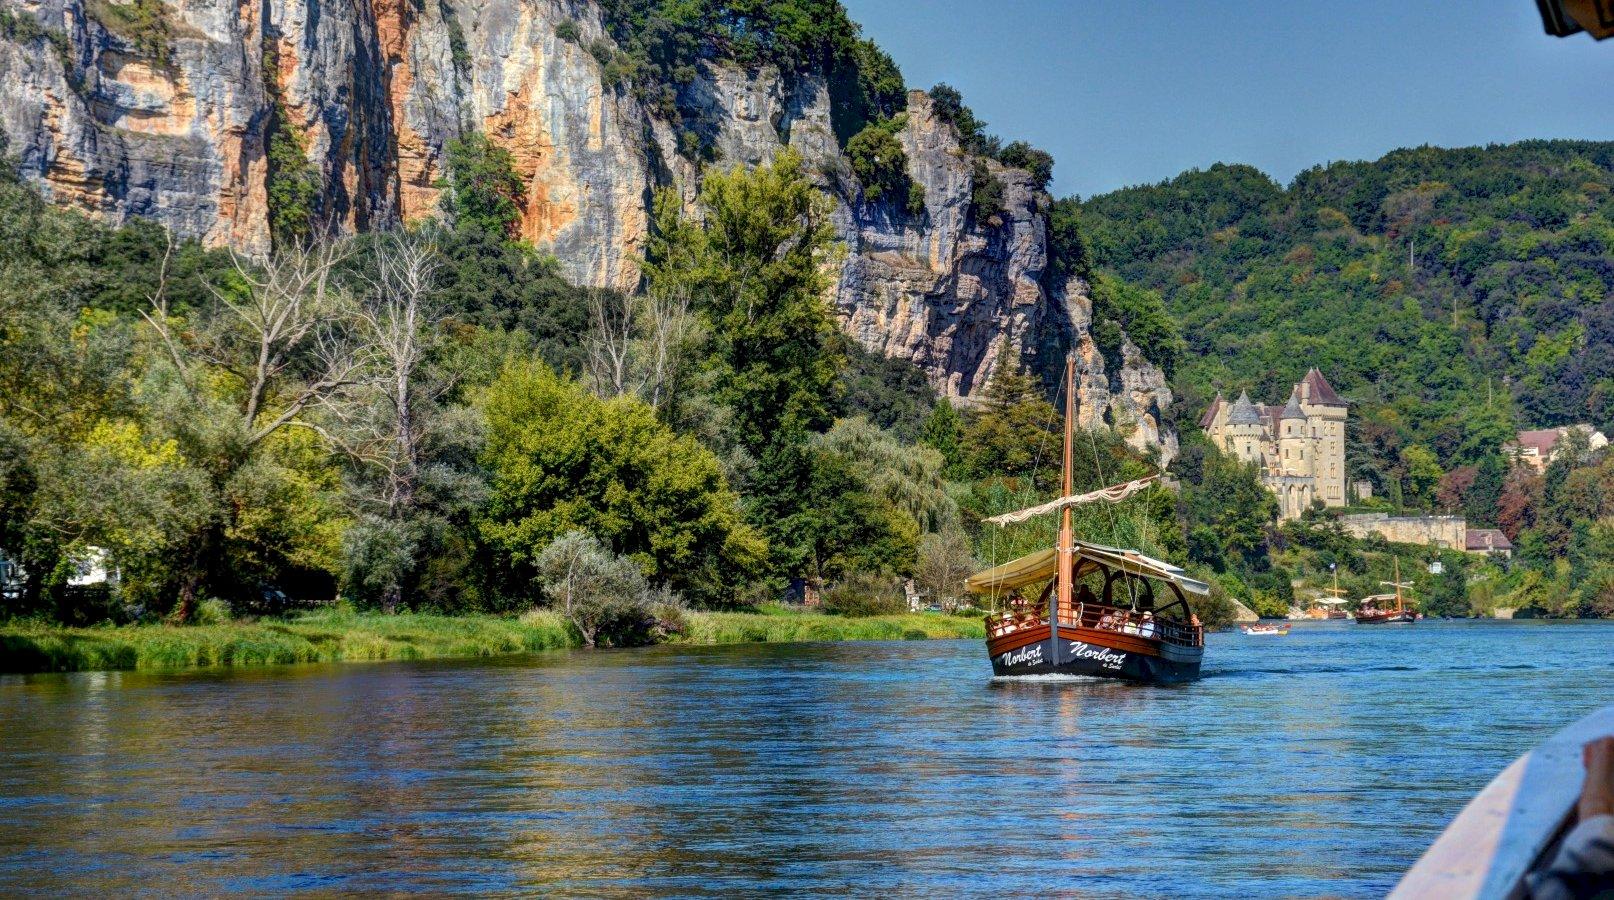 Ophorus Tours - 5 Days Dordogne Shared Travel Package - 4* Hotel Option